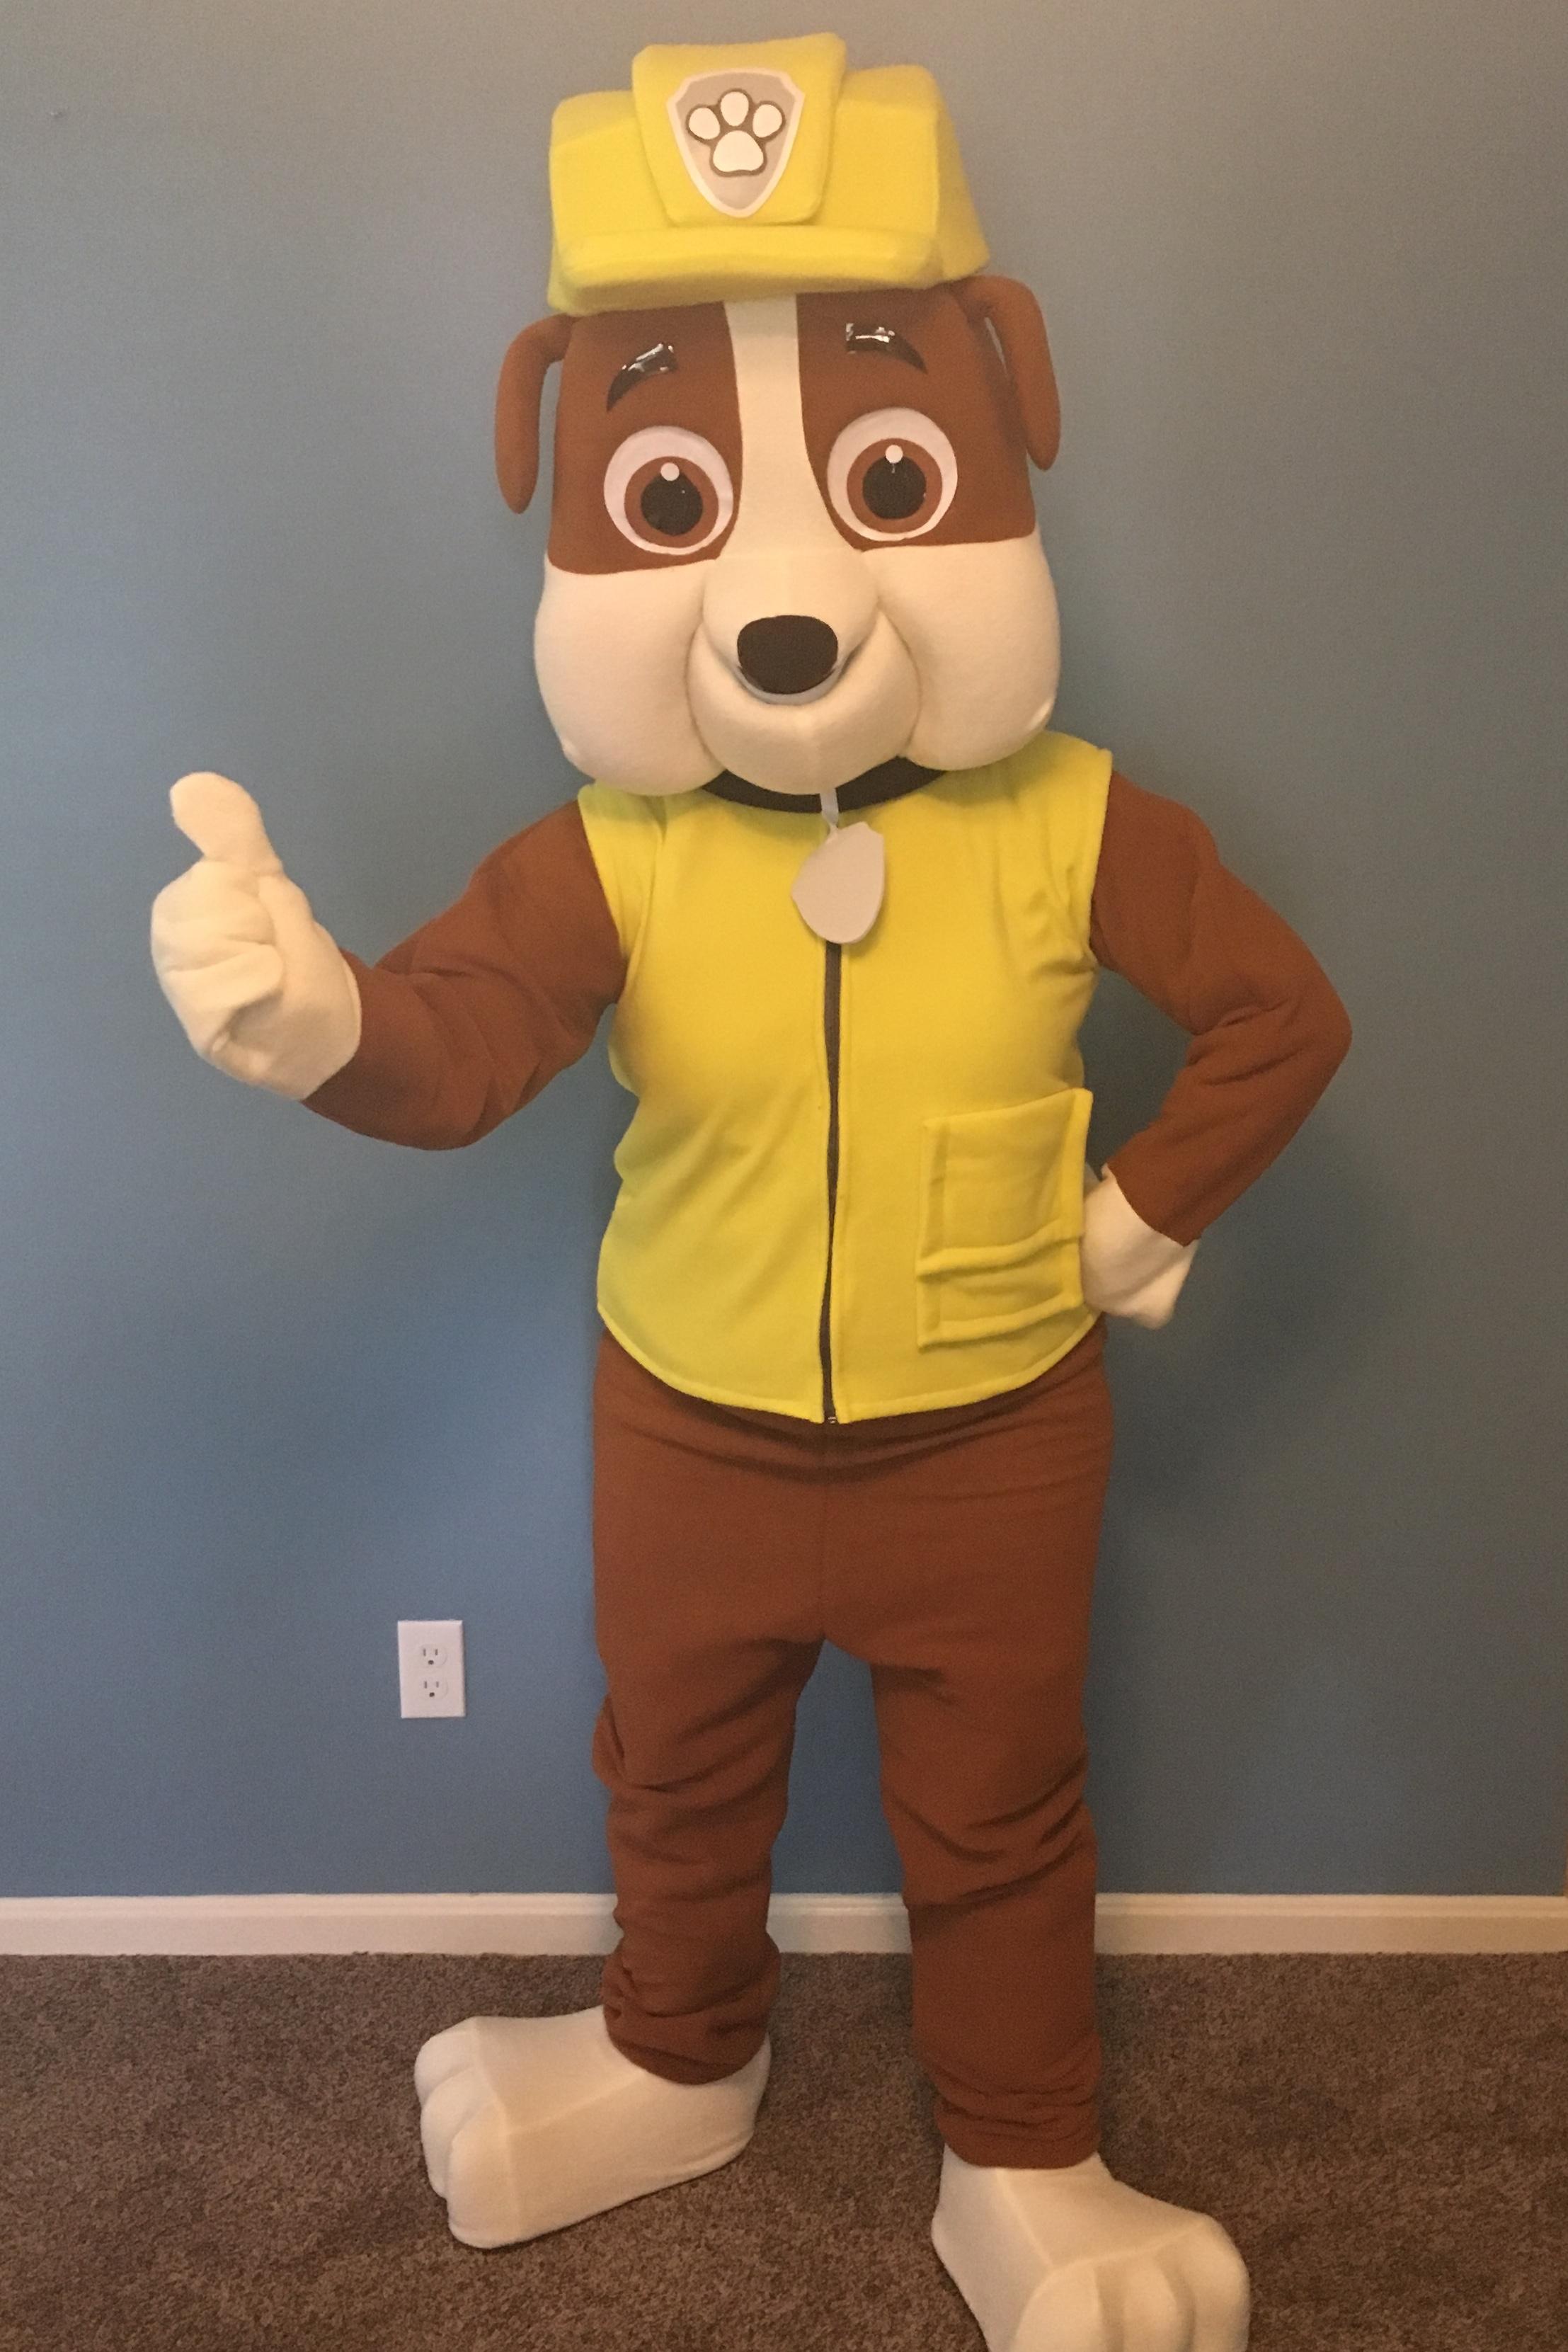 Mascot #51